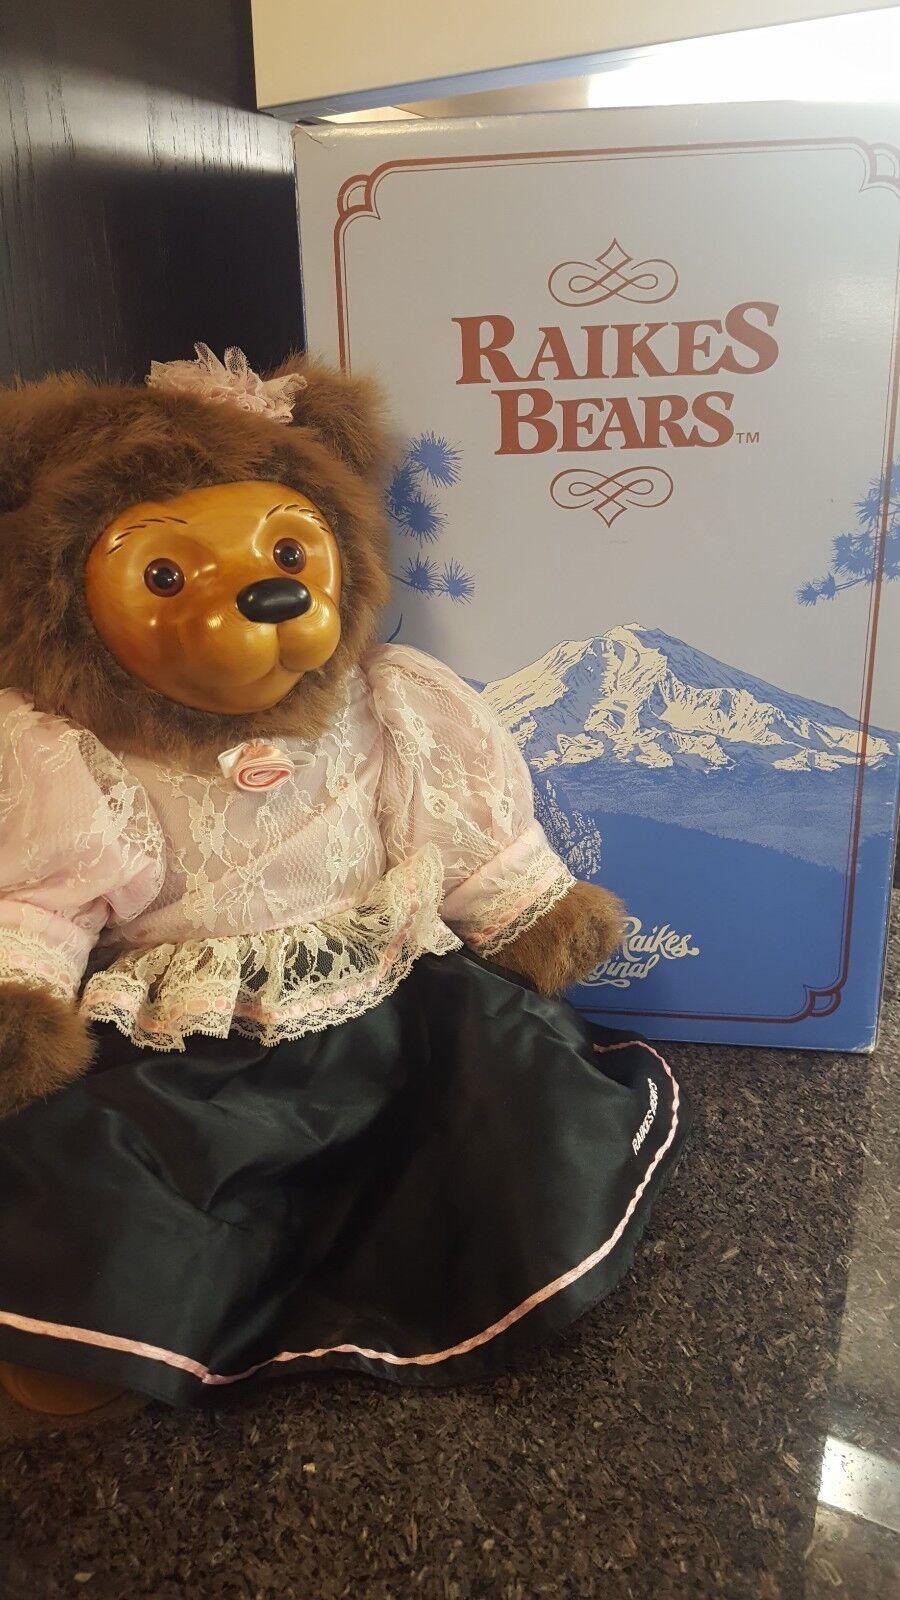 Kittie Old West Teddy Bear, Robert Raikes RARE Doll, Flawless Mint Condition